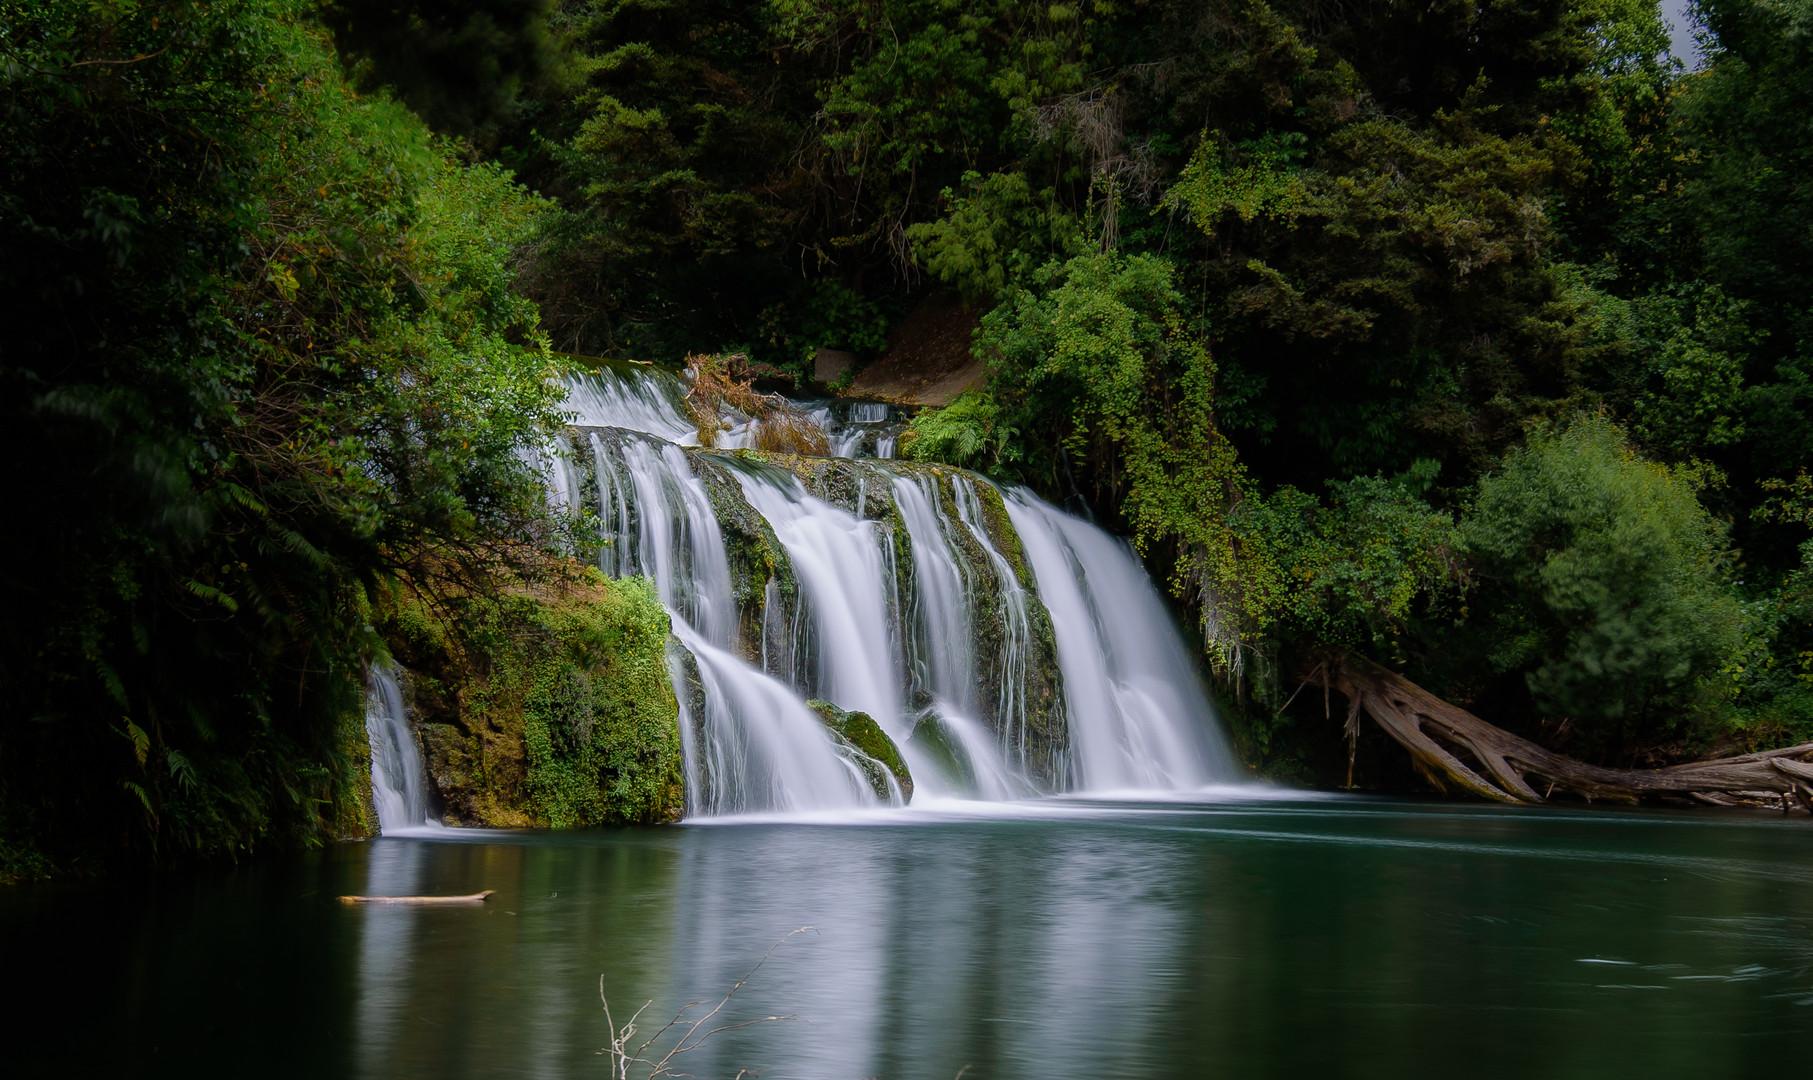 Rijo Varghese | Maraetotara Falls